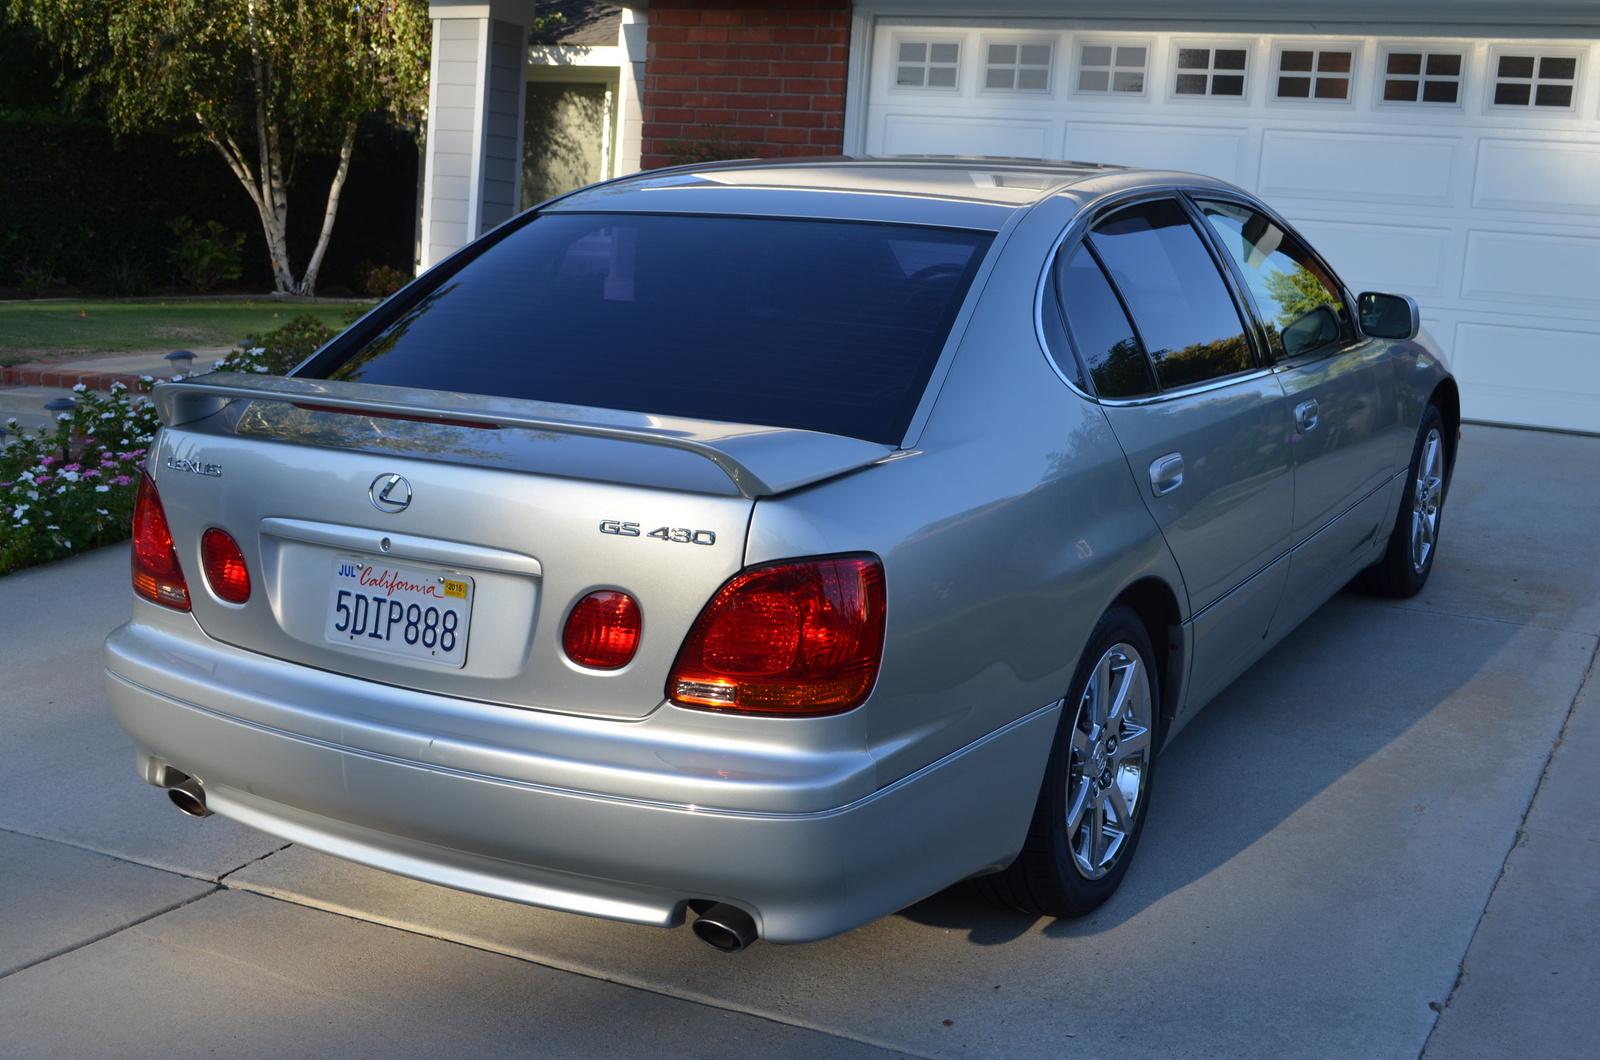 Picture of 2003 Lexus GS 430 Base